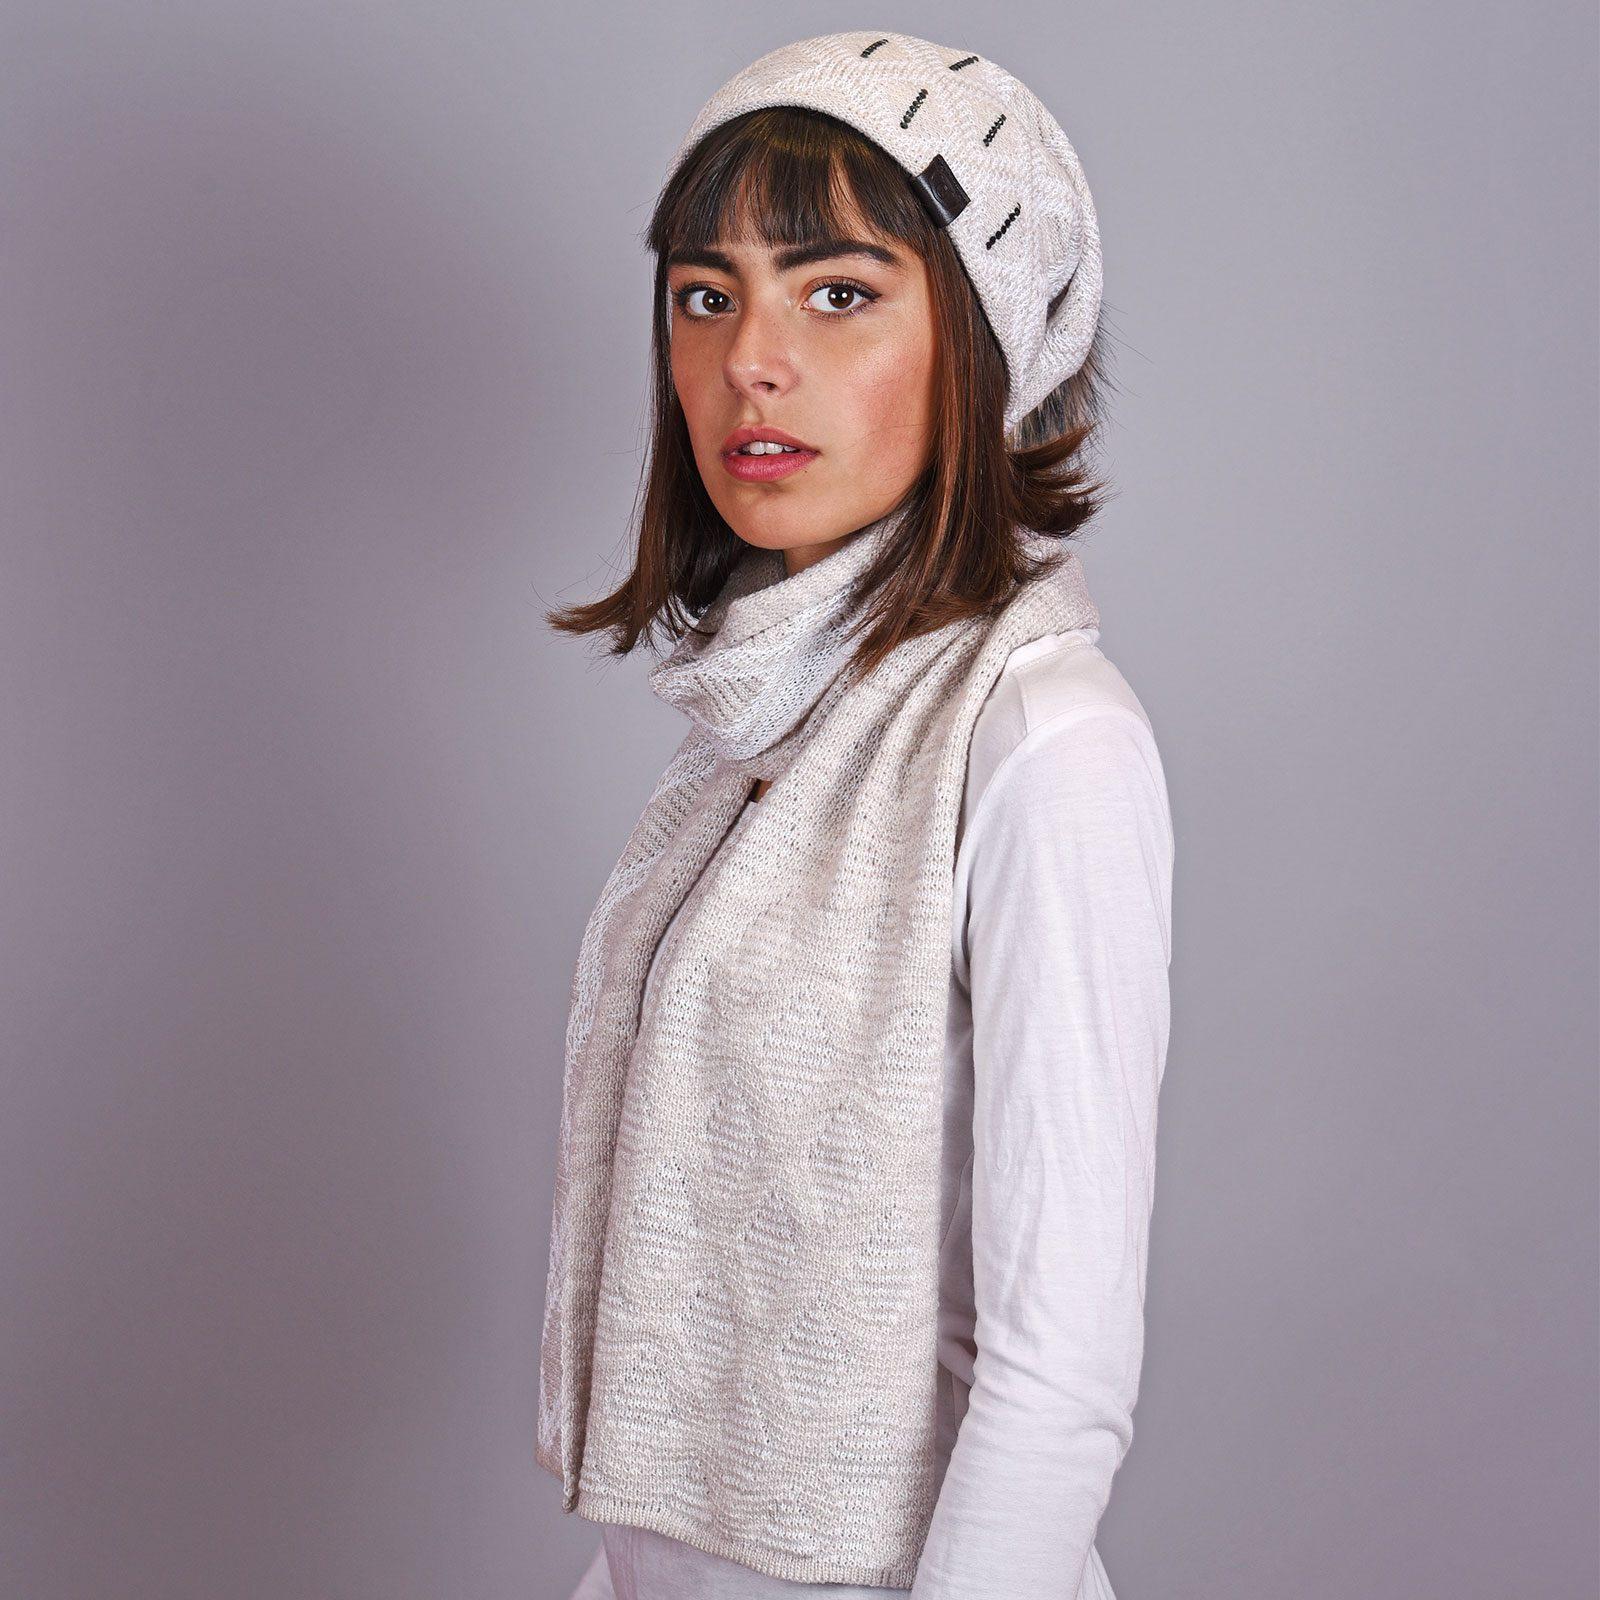 http://lookbook.allee-du-foulard.fr/wp-content/uploads/2018/12/AT-04587-VF16-echarpe-et-bonnet-femme-beige-1600x1600.jpg